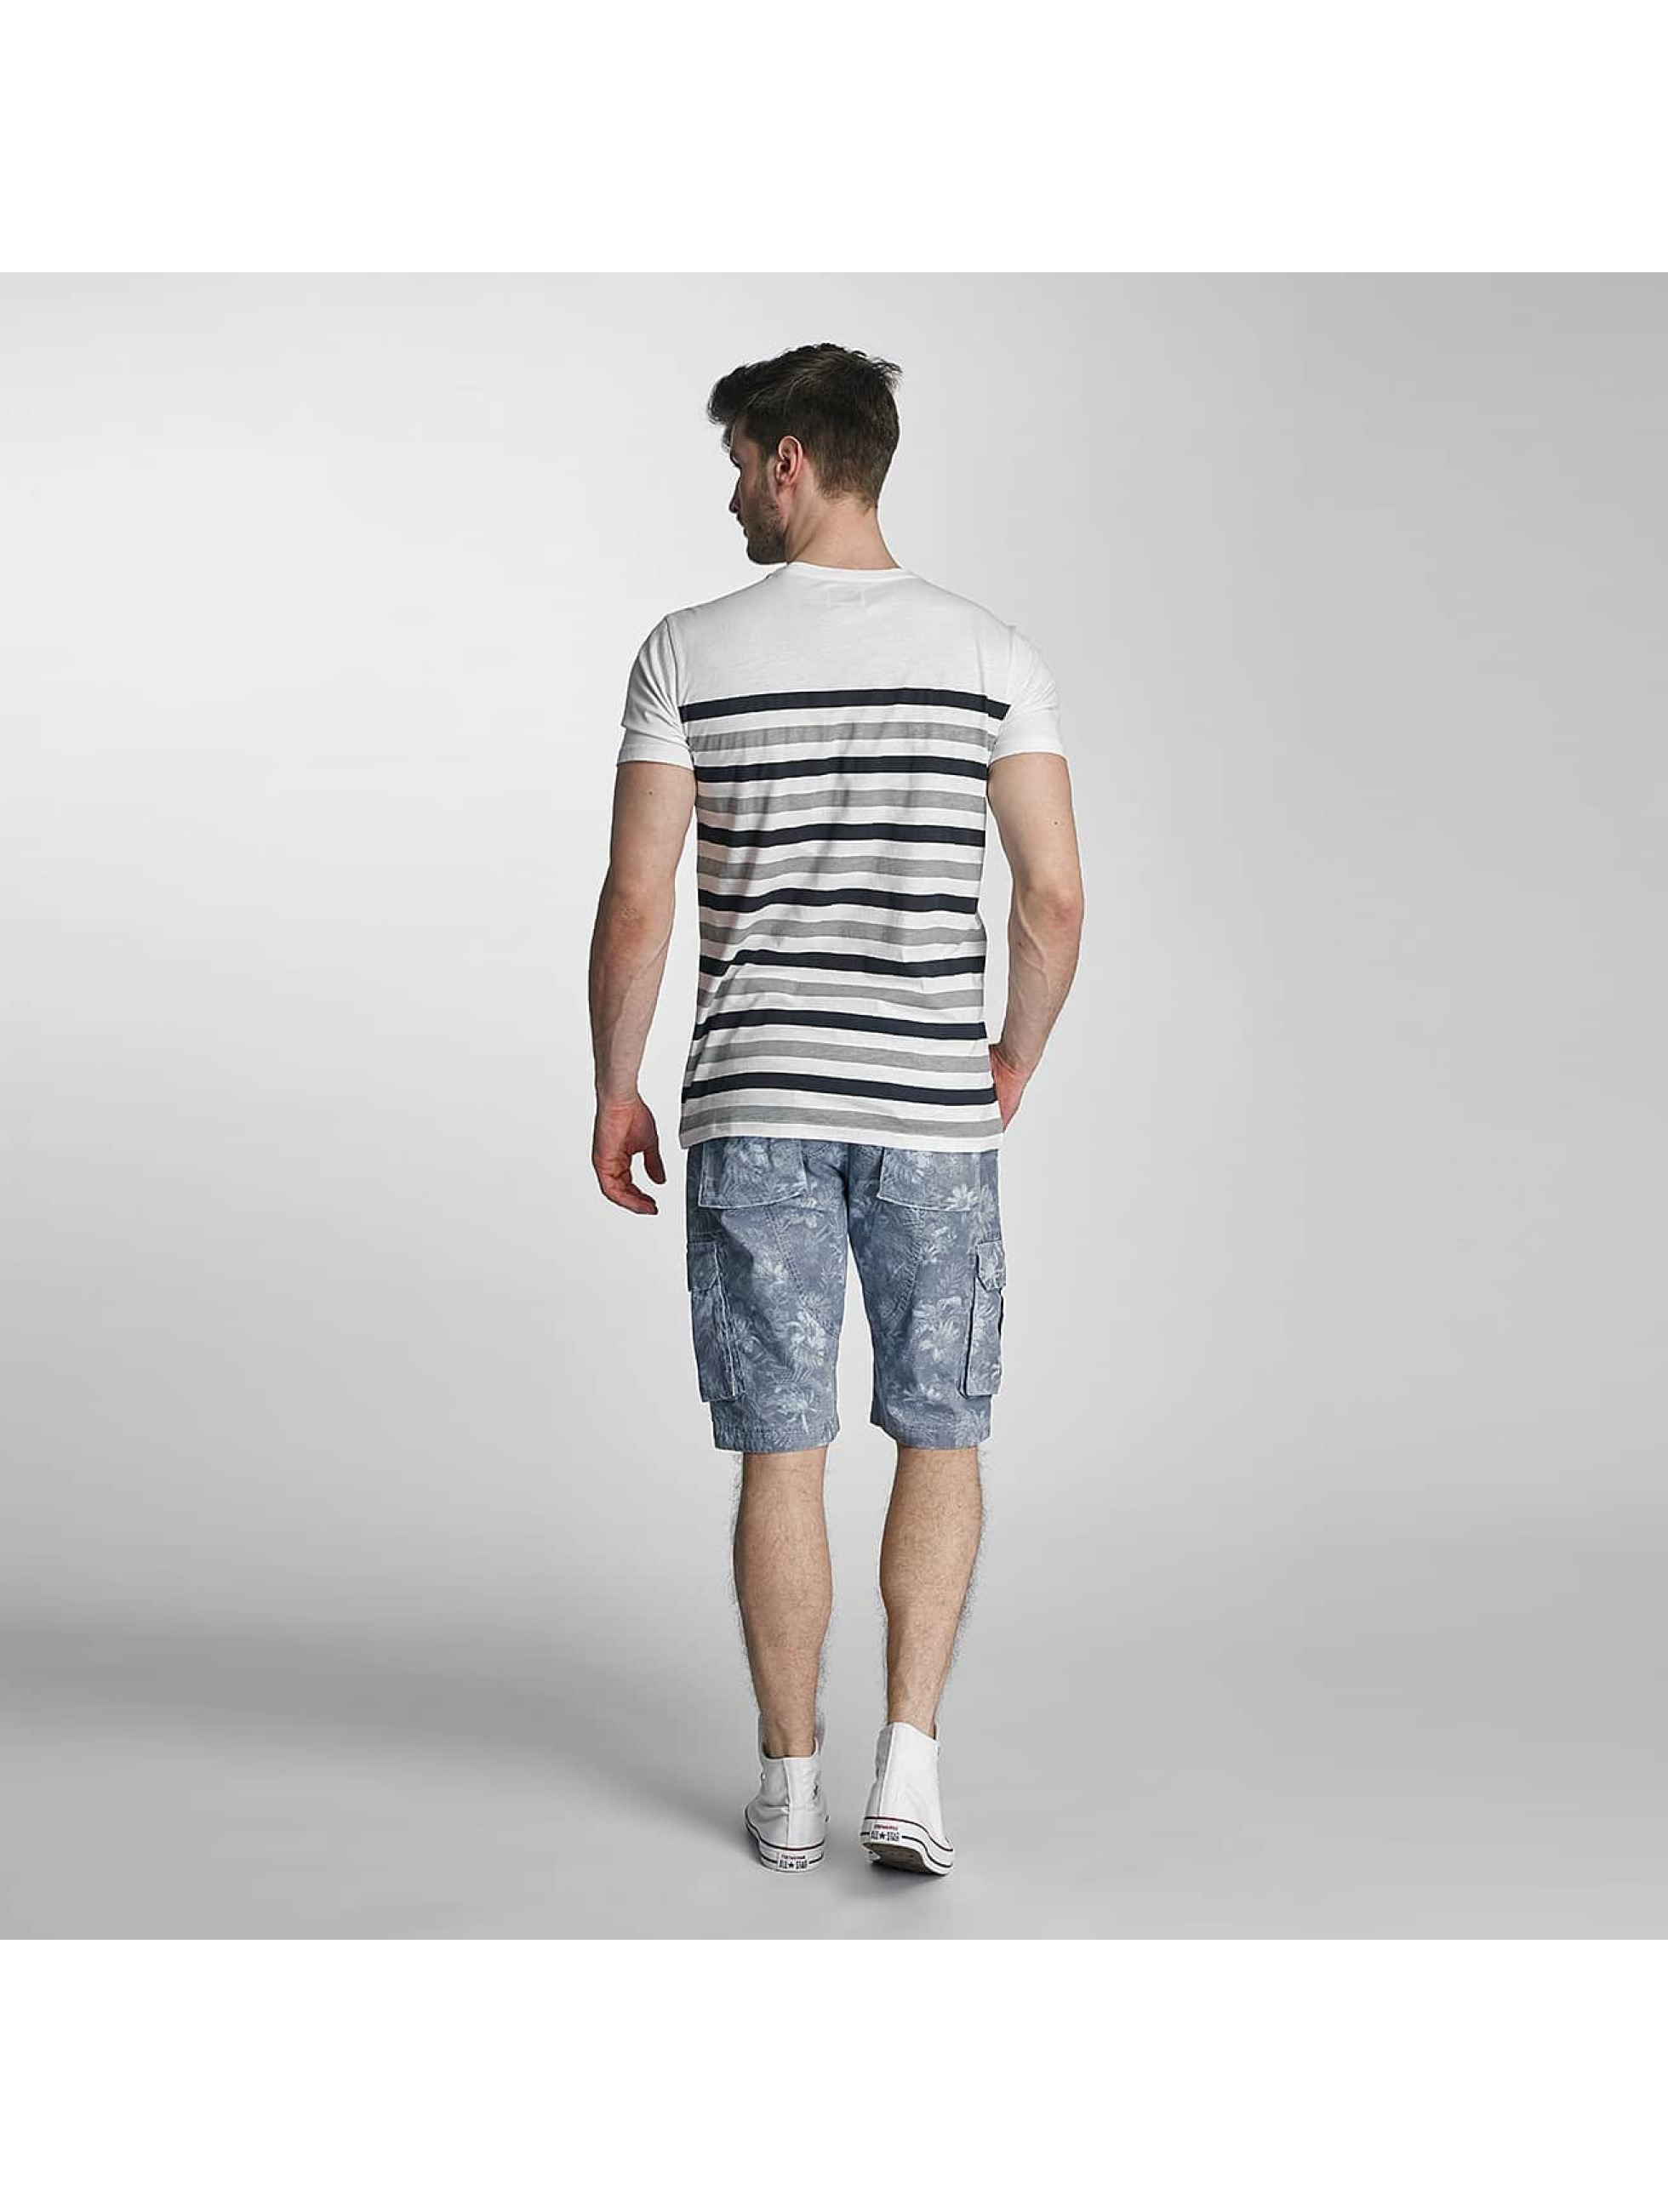 SHINE Original T-skjorter Striped grå